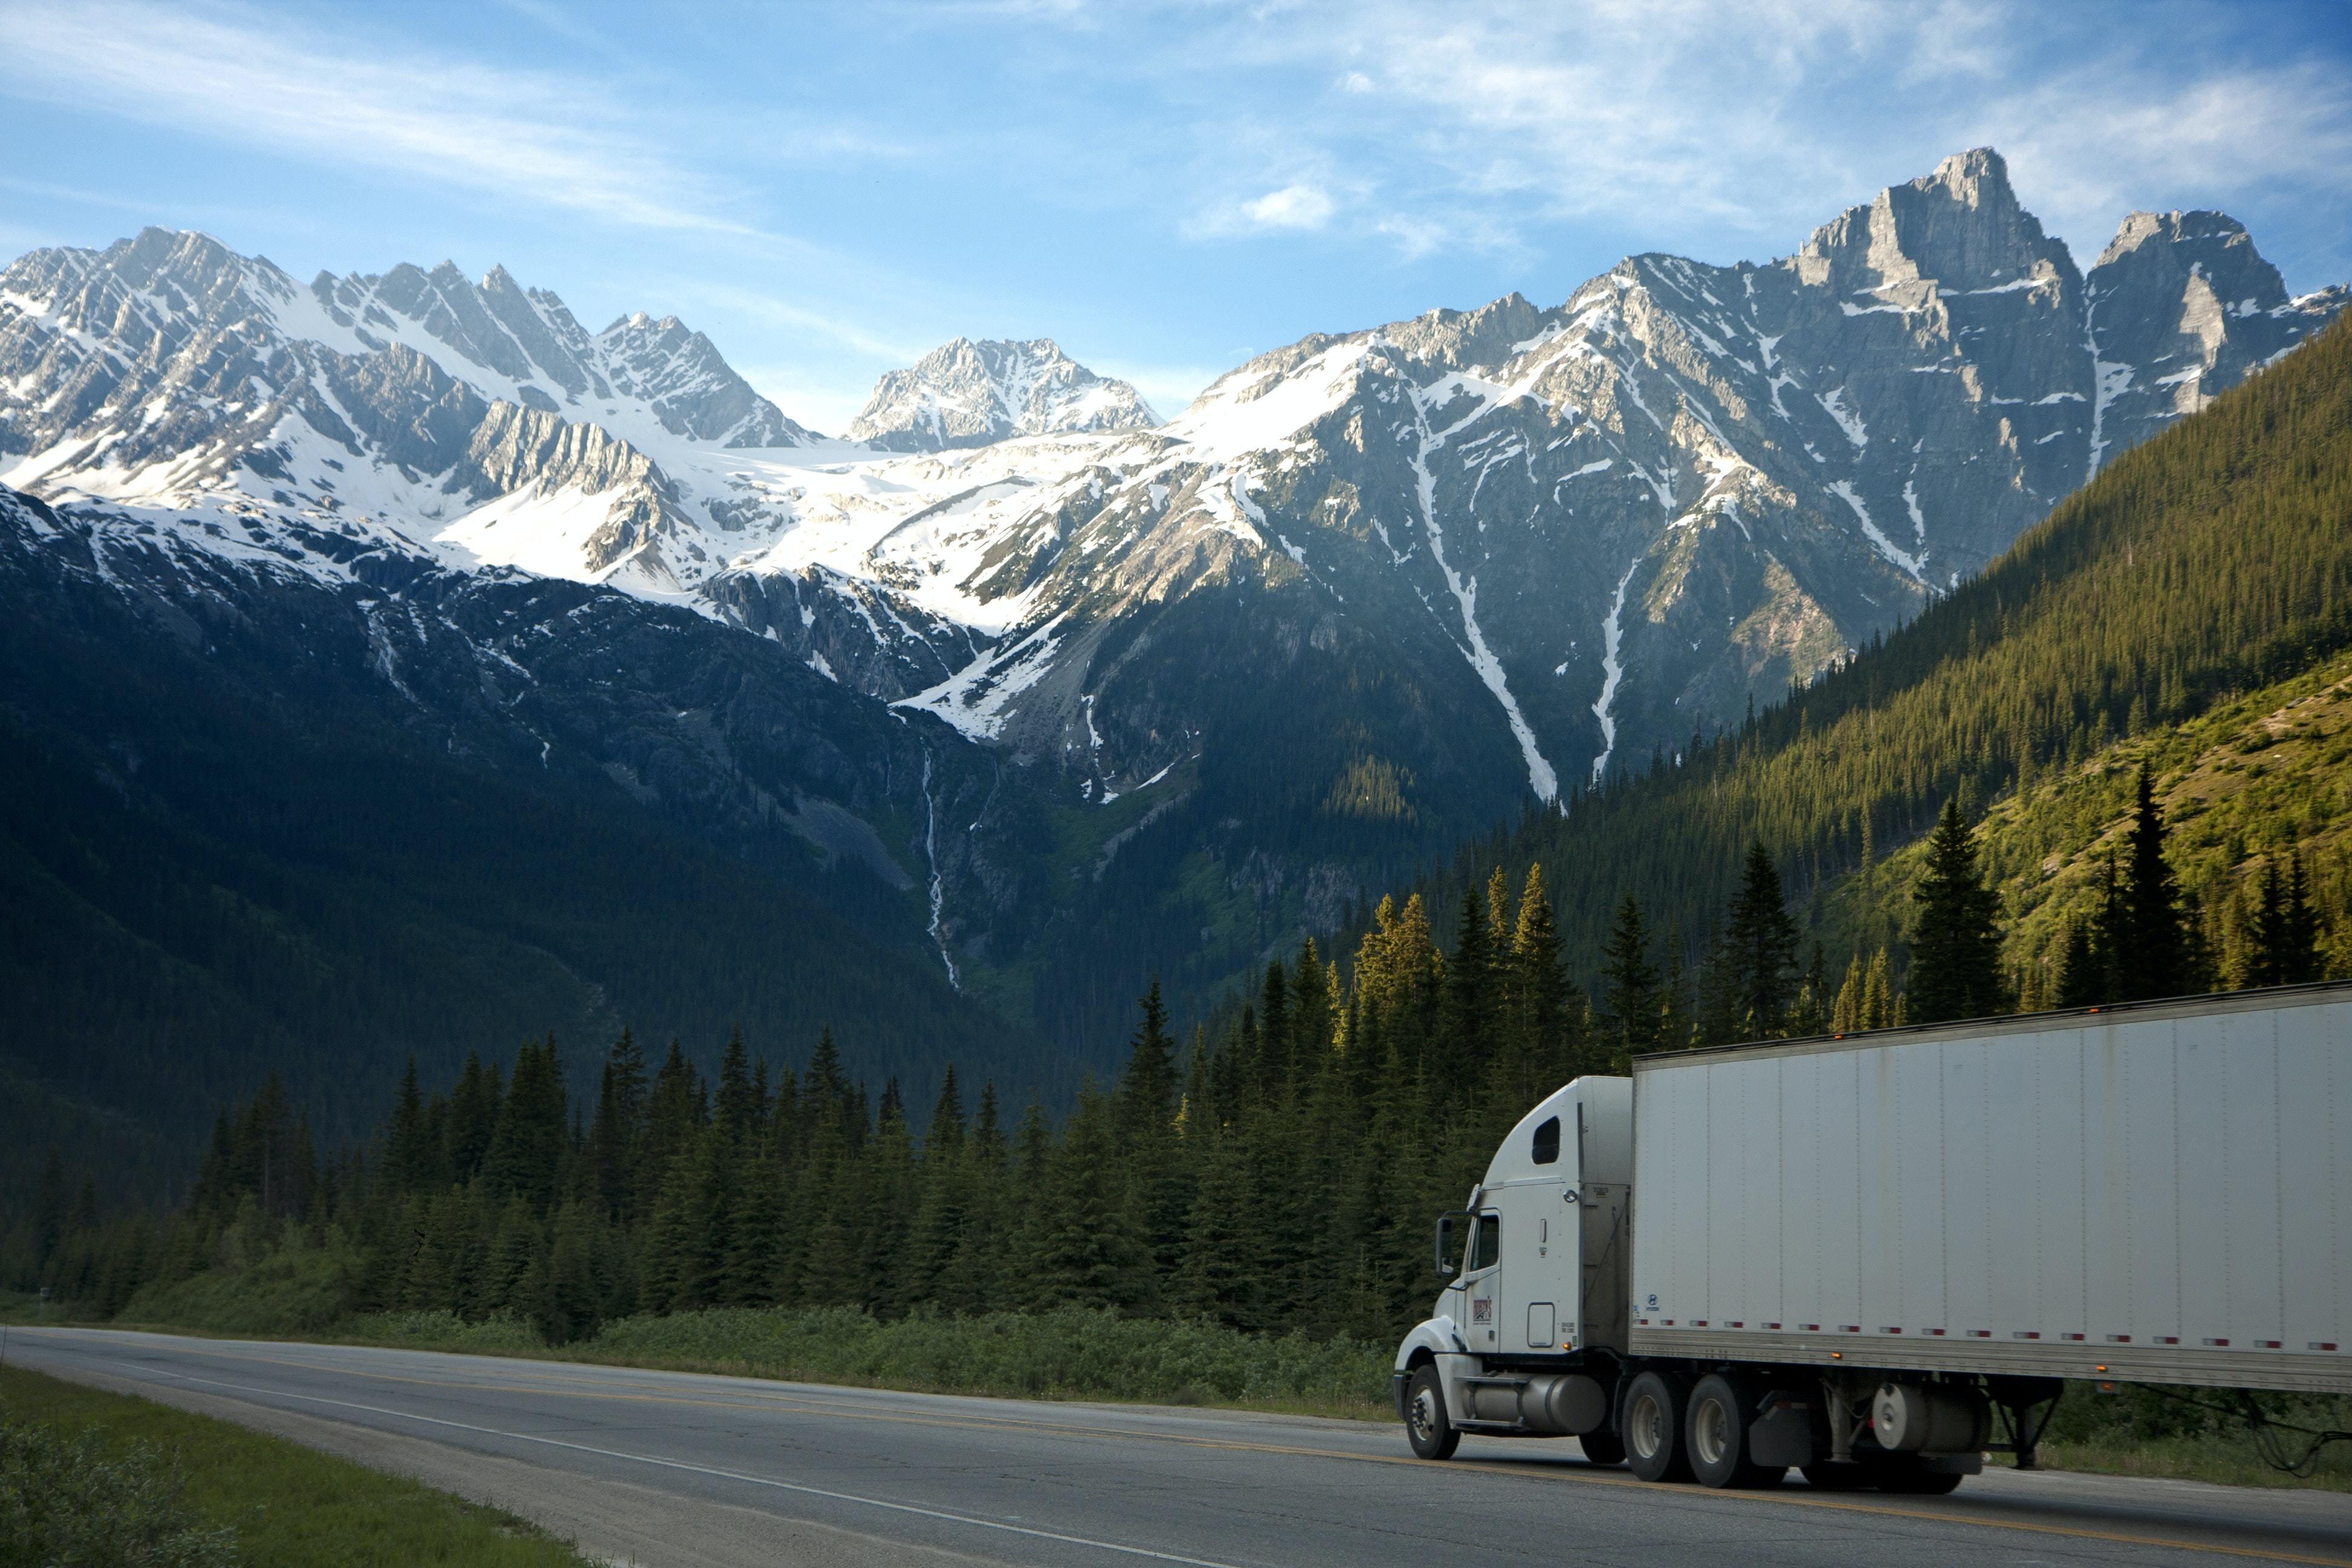 Heavy duty truck driving through mountainous landscape.